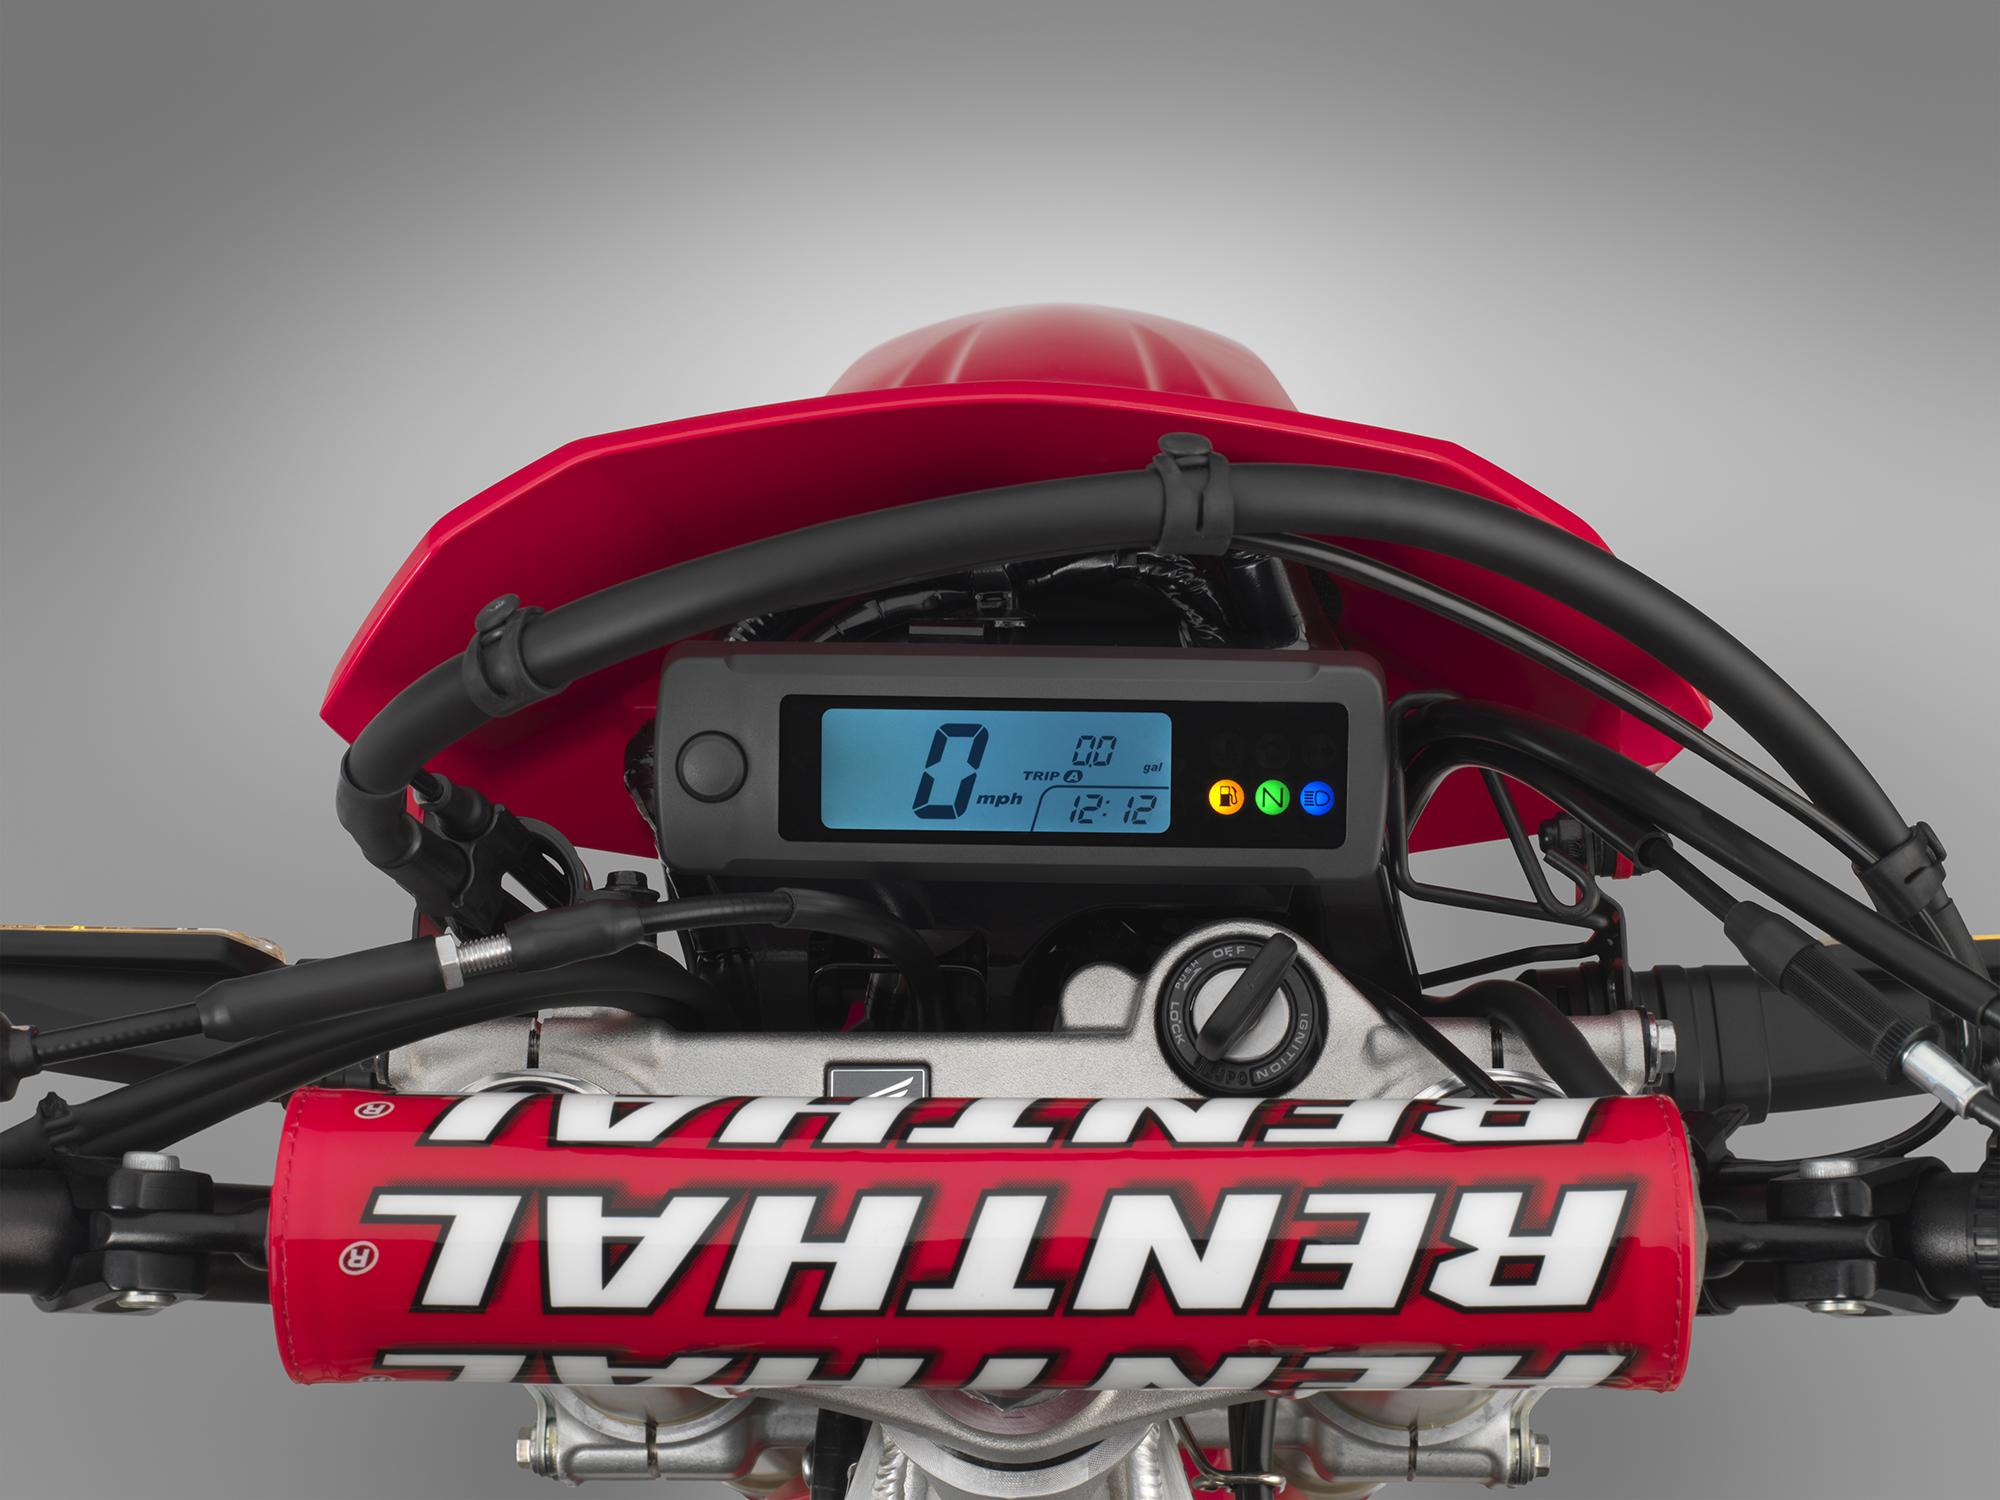 19 Honda CRF450L_instruments.jpg